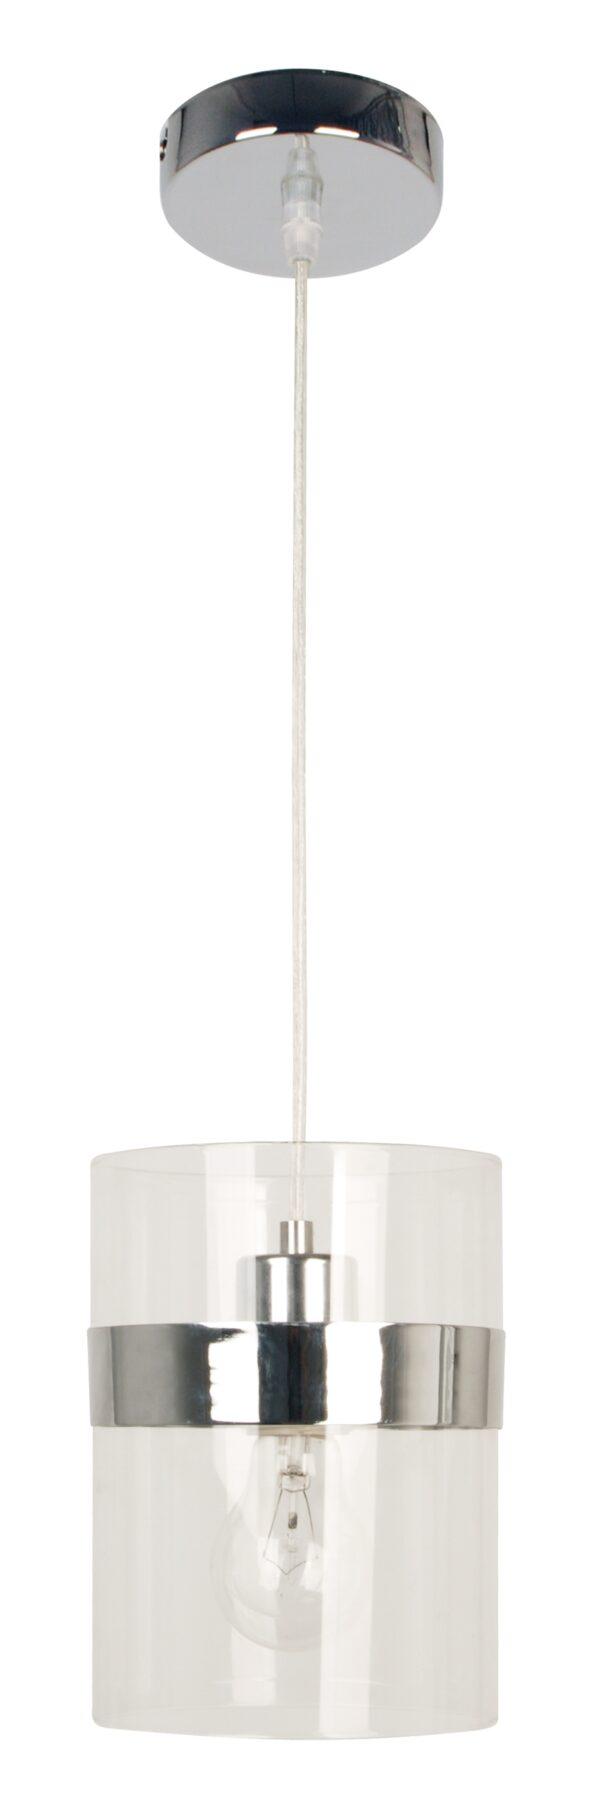 BRANDO LAMPA WISZĄCA 15 1X60W E27 CHROM / TRANSPARENT - 31-28044